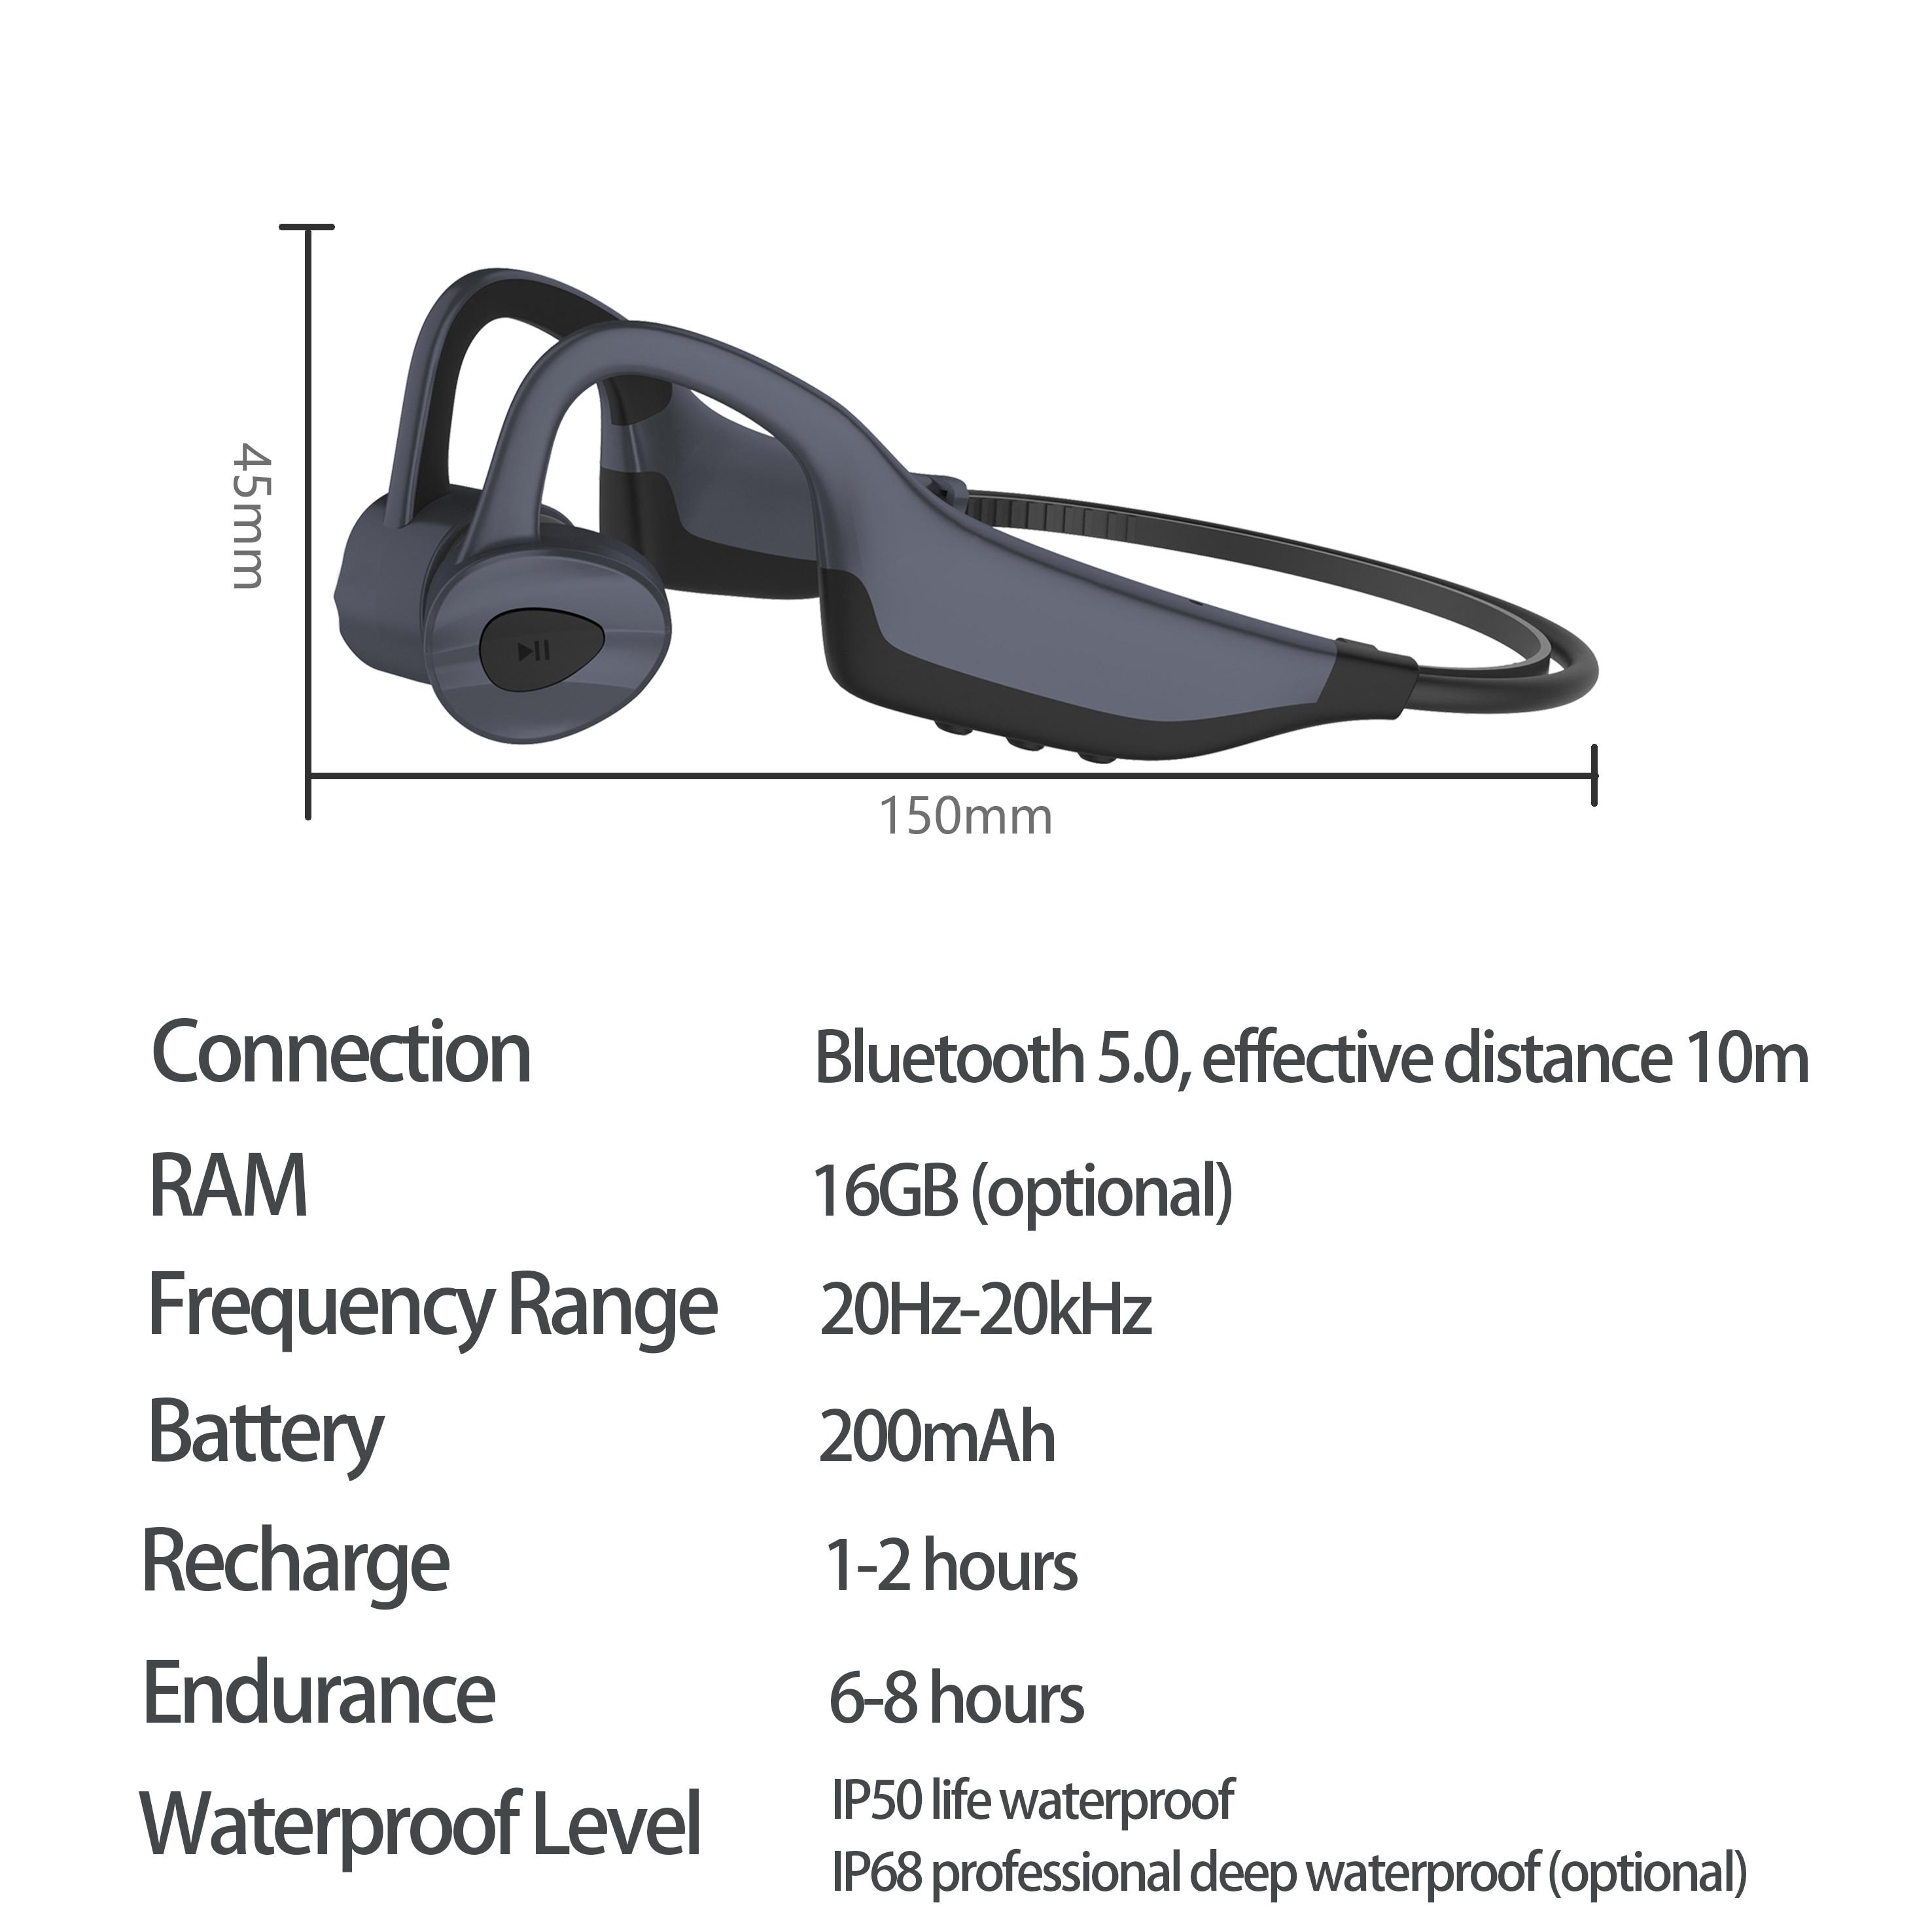 New Swim Bone Conduction Headphones Bluetooth Wireless Earphone 16GB MP3 Music Player Waterproof Earbuds Fitness Sport Headset enlarge